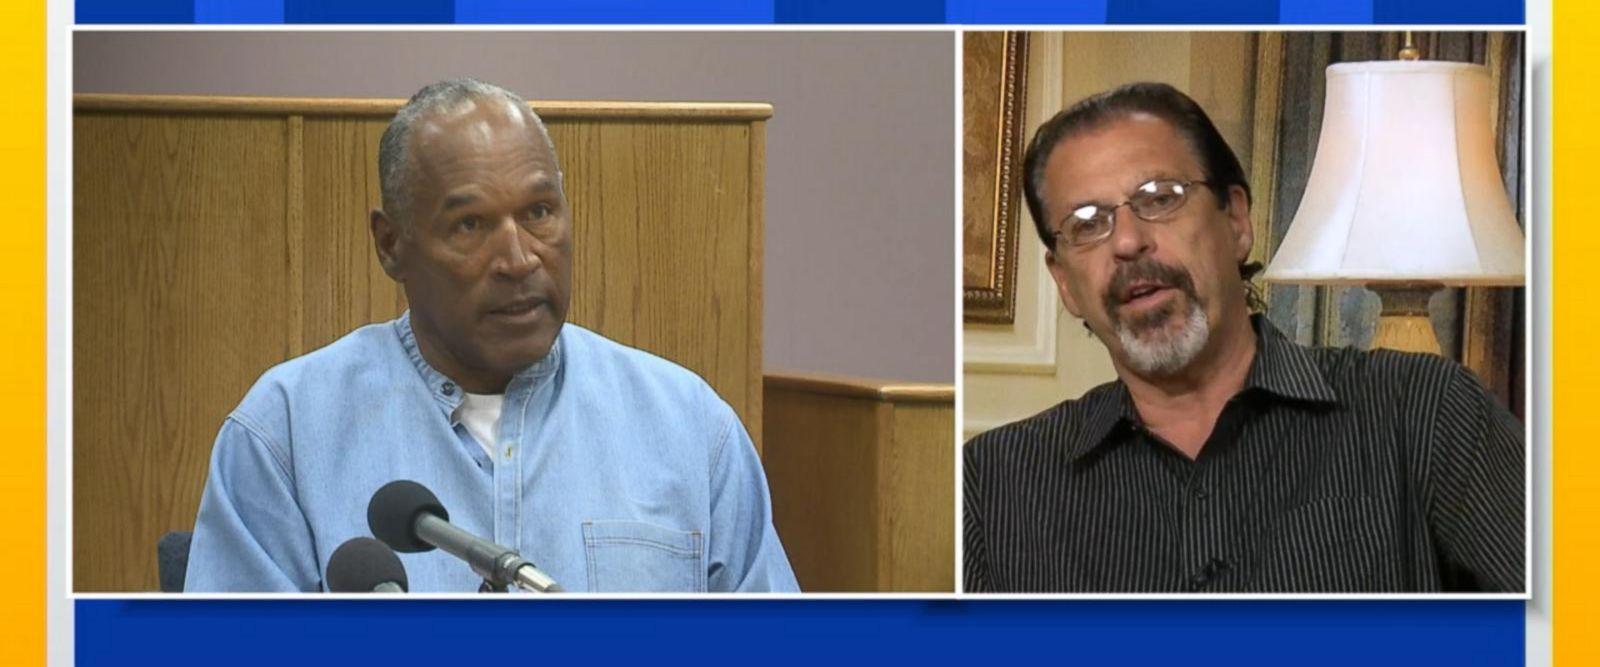 VIDEO: OJ Simpson robbery attempt victim reacts to parole